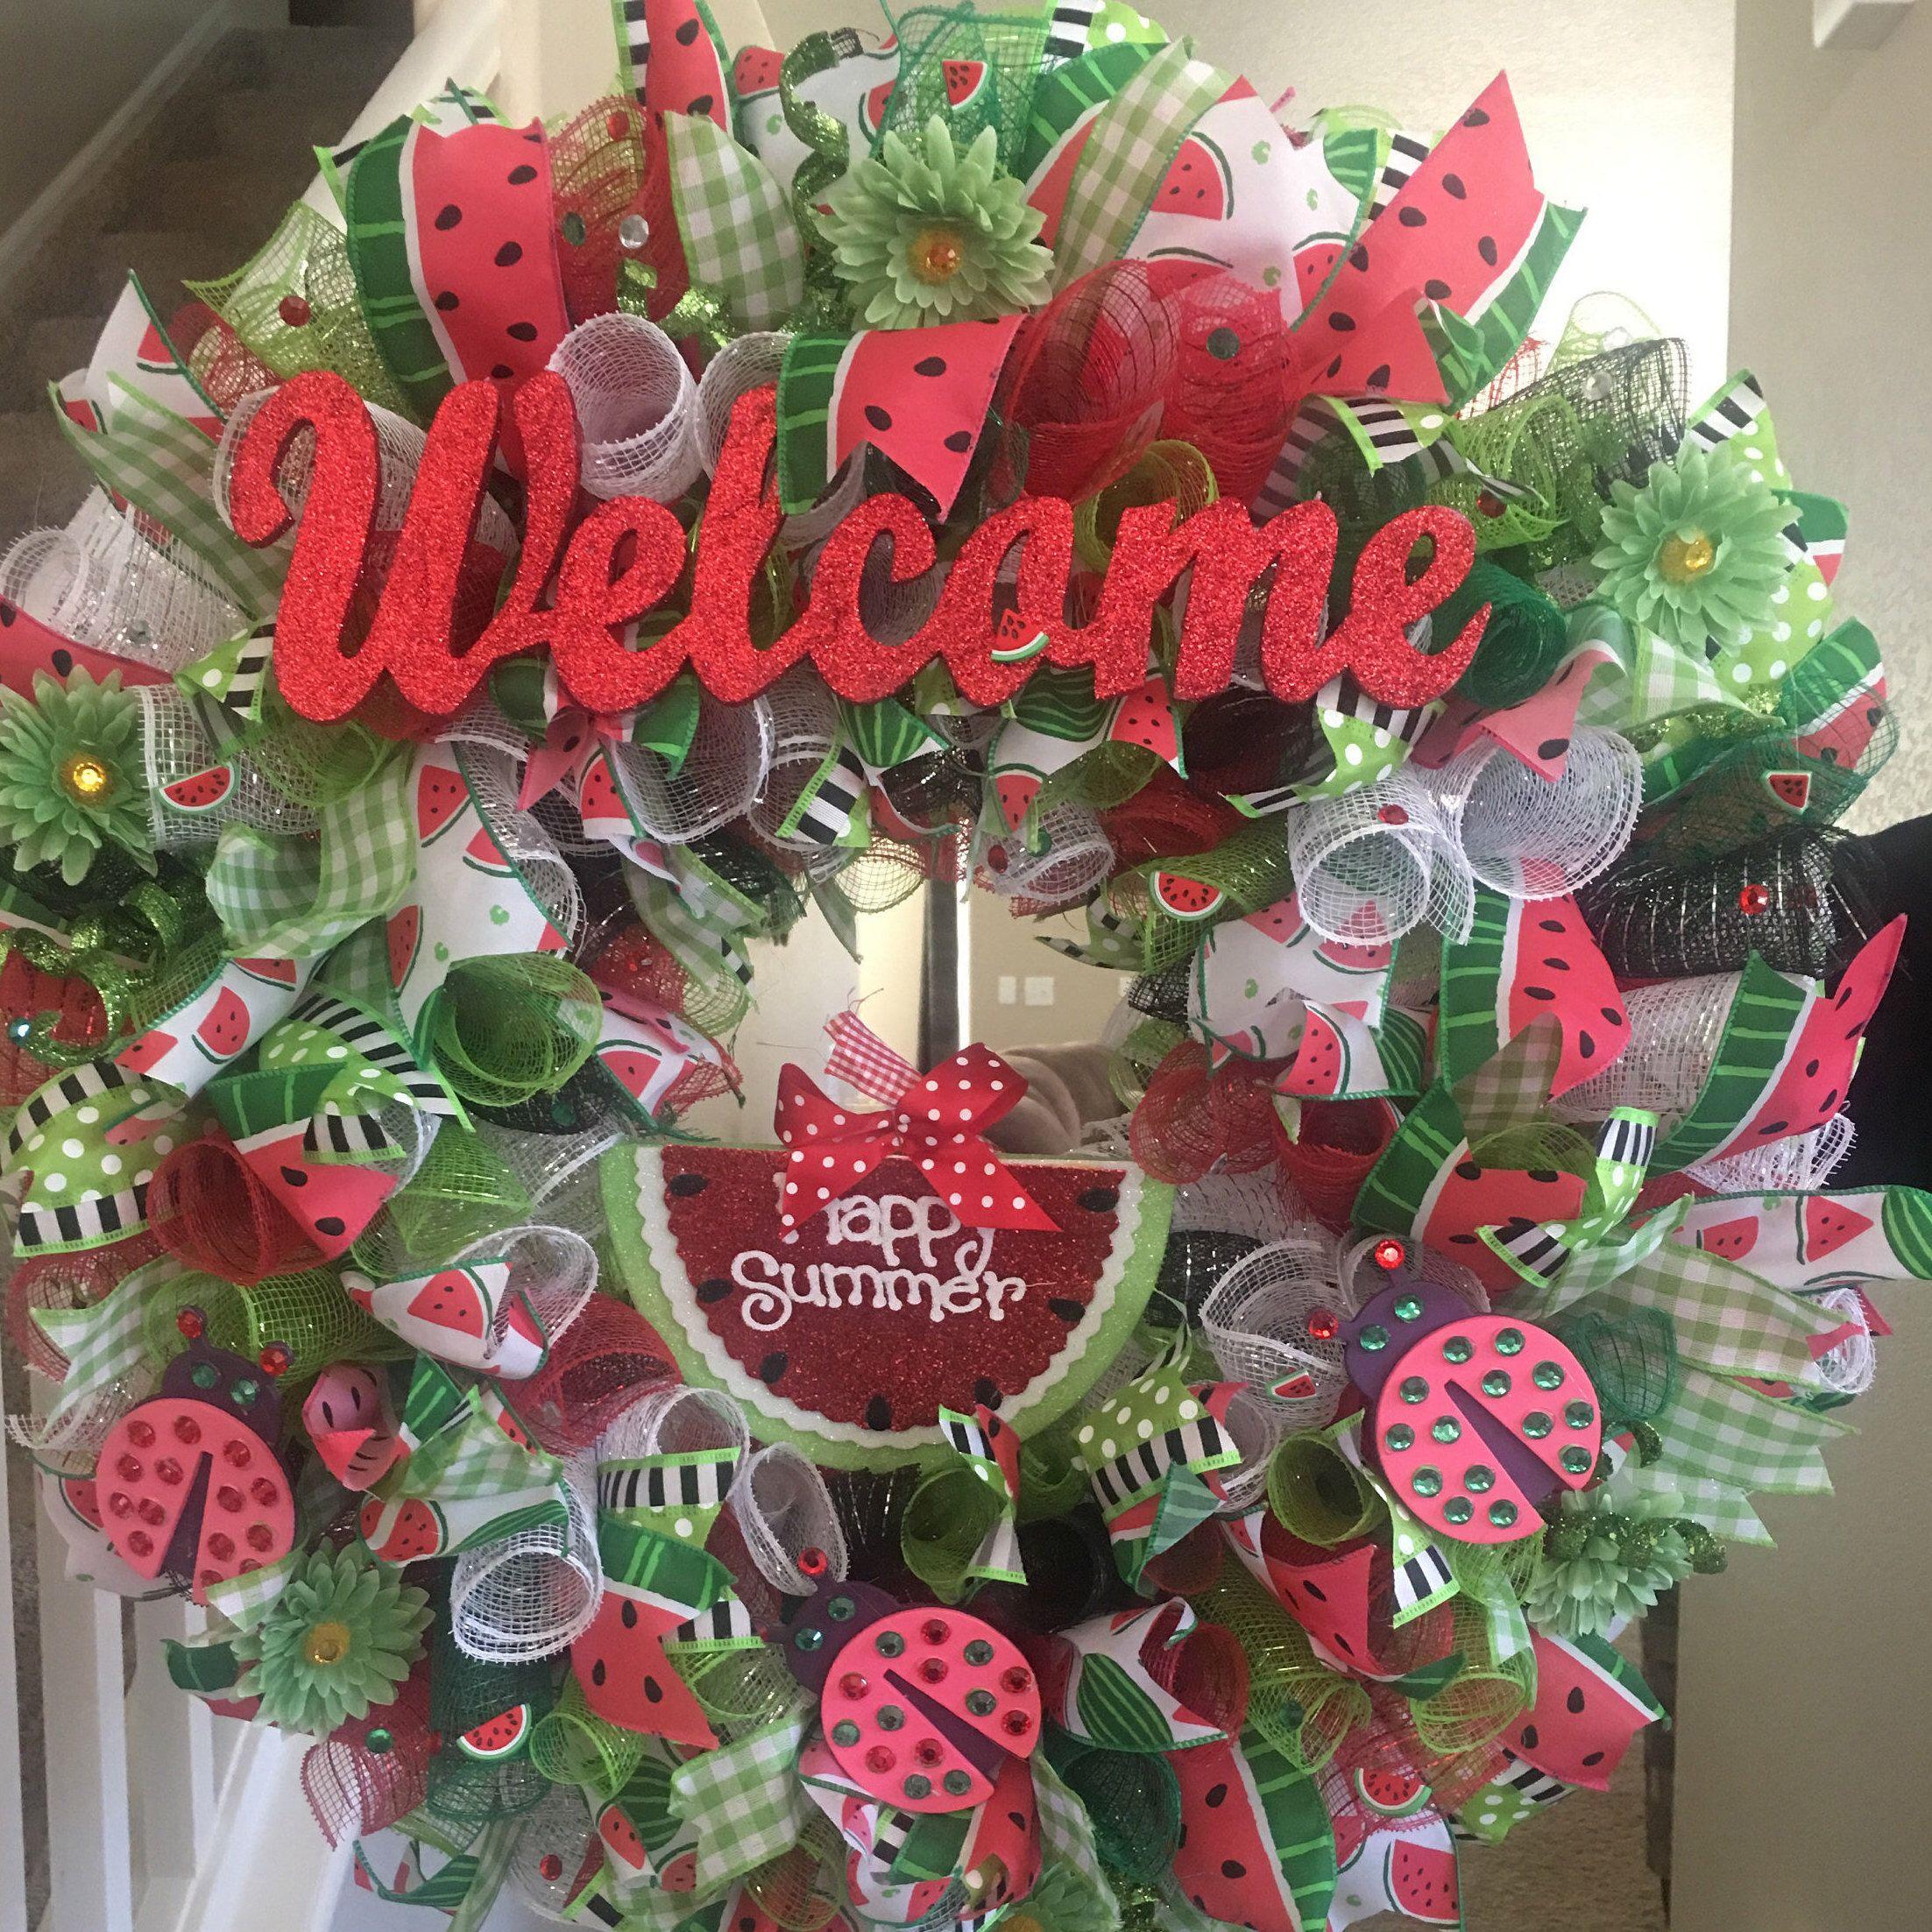 Watermelon Welcome Wreath By Allmeshedupdesignz On Etsy Httpswwwetsycom